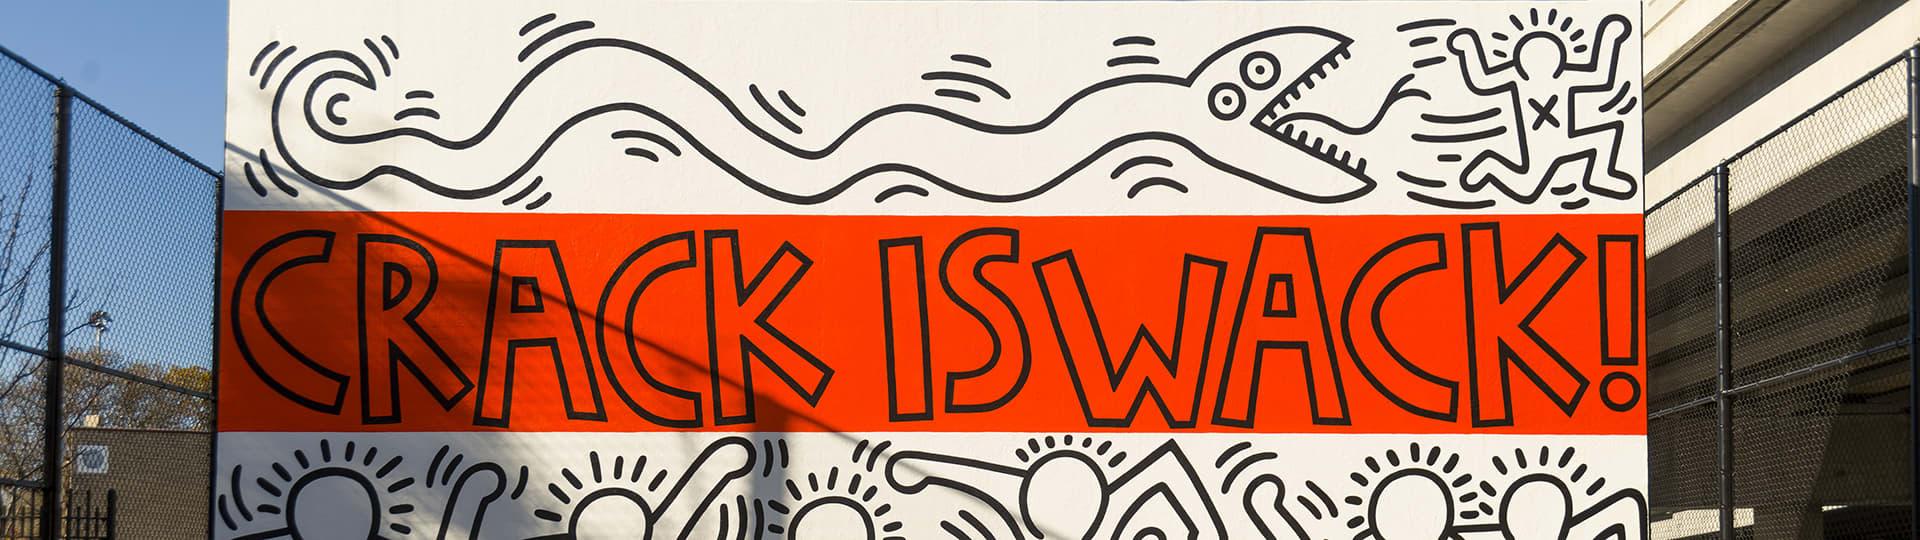 Keith Haring artwork